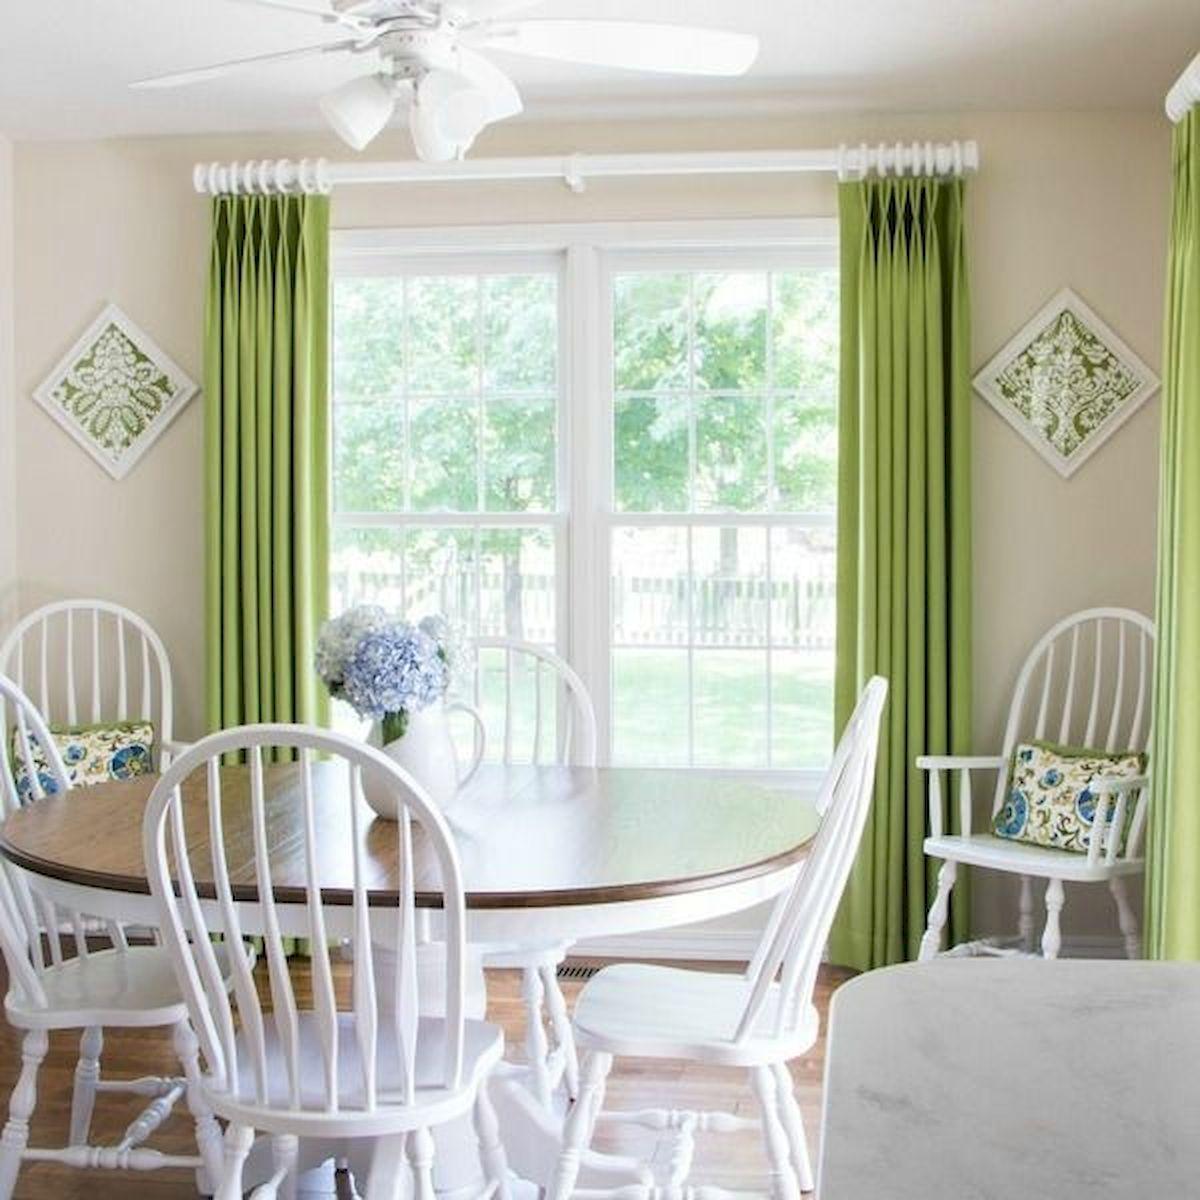 45 Colorful Interior Home Design and Decor Ideas (24)